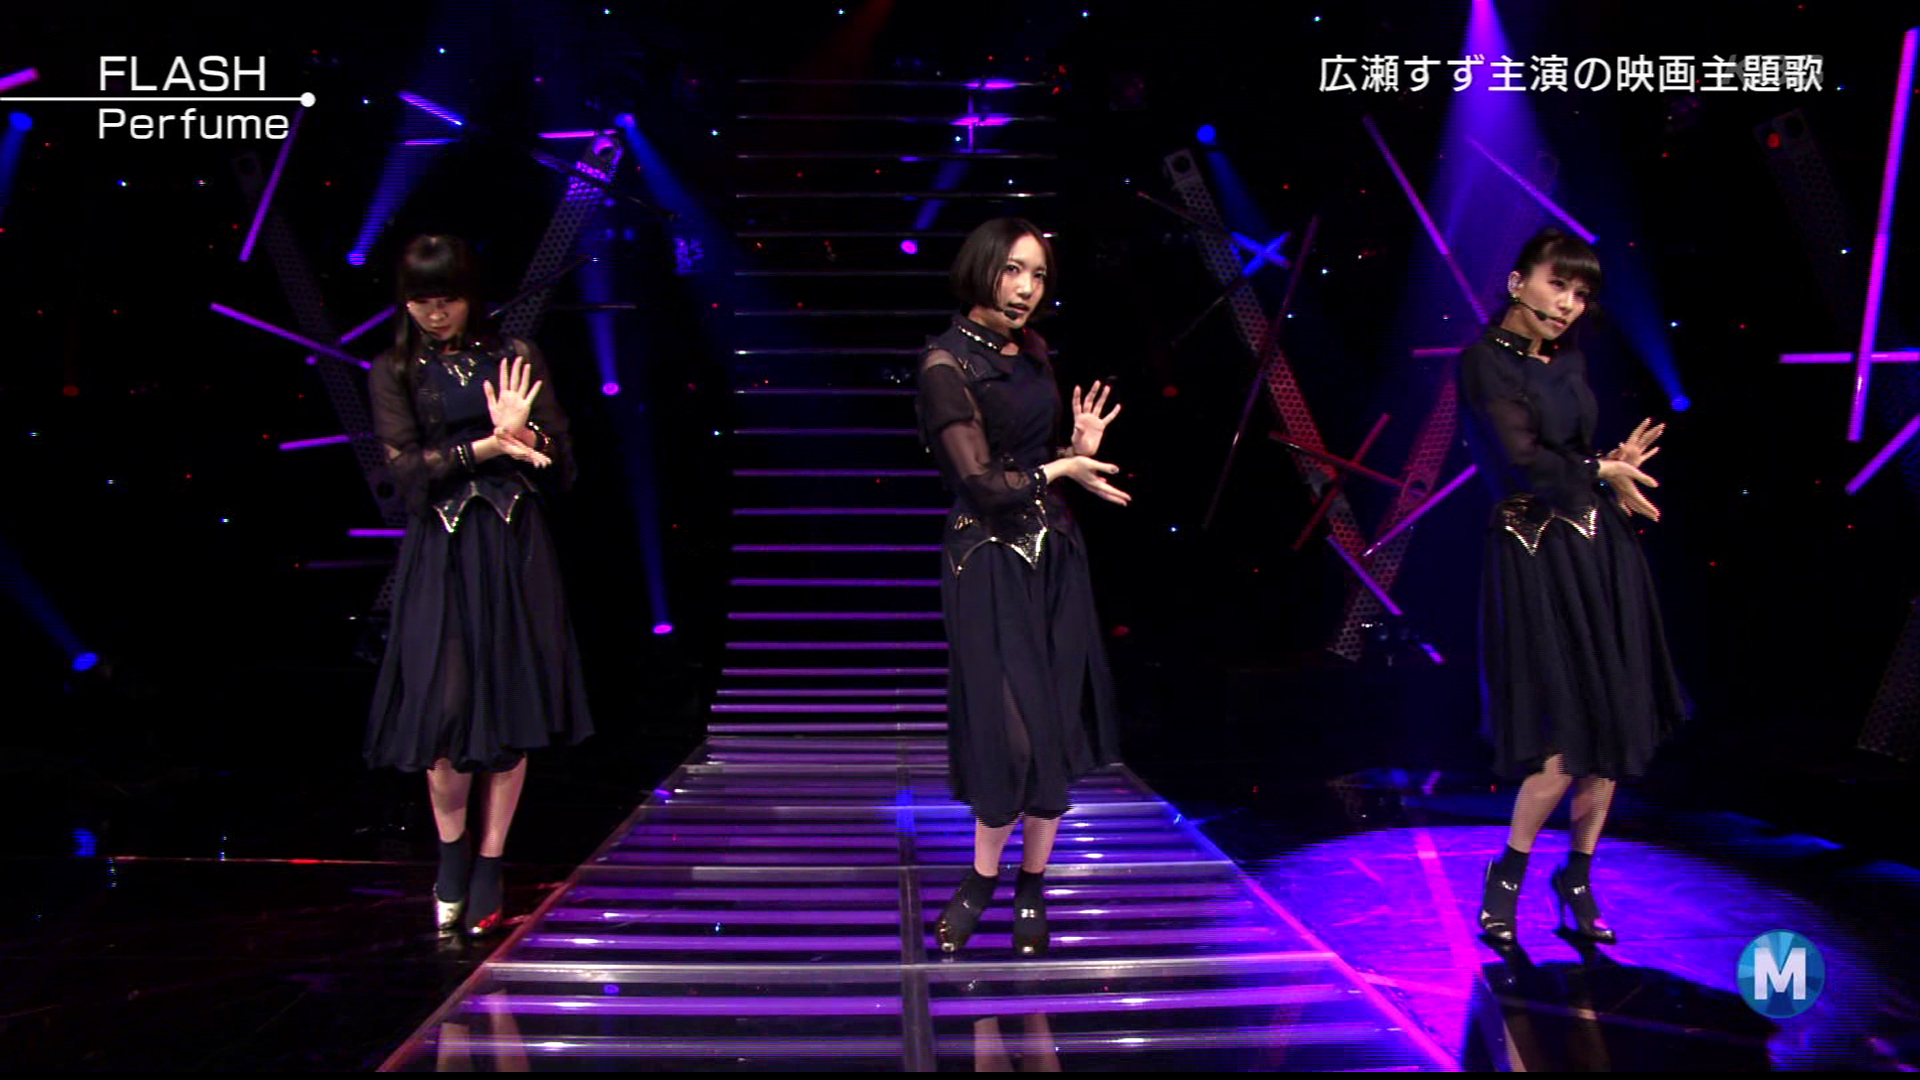 20170411.0446.2 Perfume - Flash (Music Station 2016.04.15) (JPOP.ru).ts.jpg